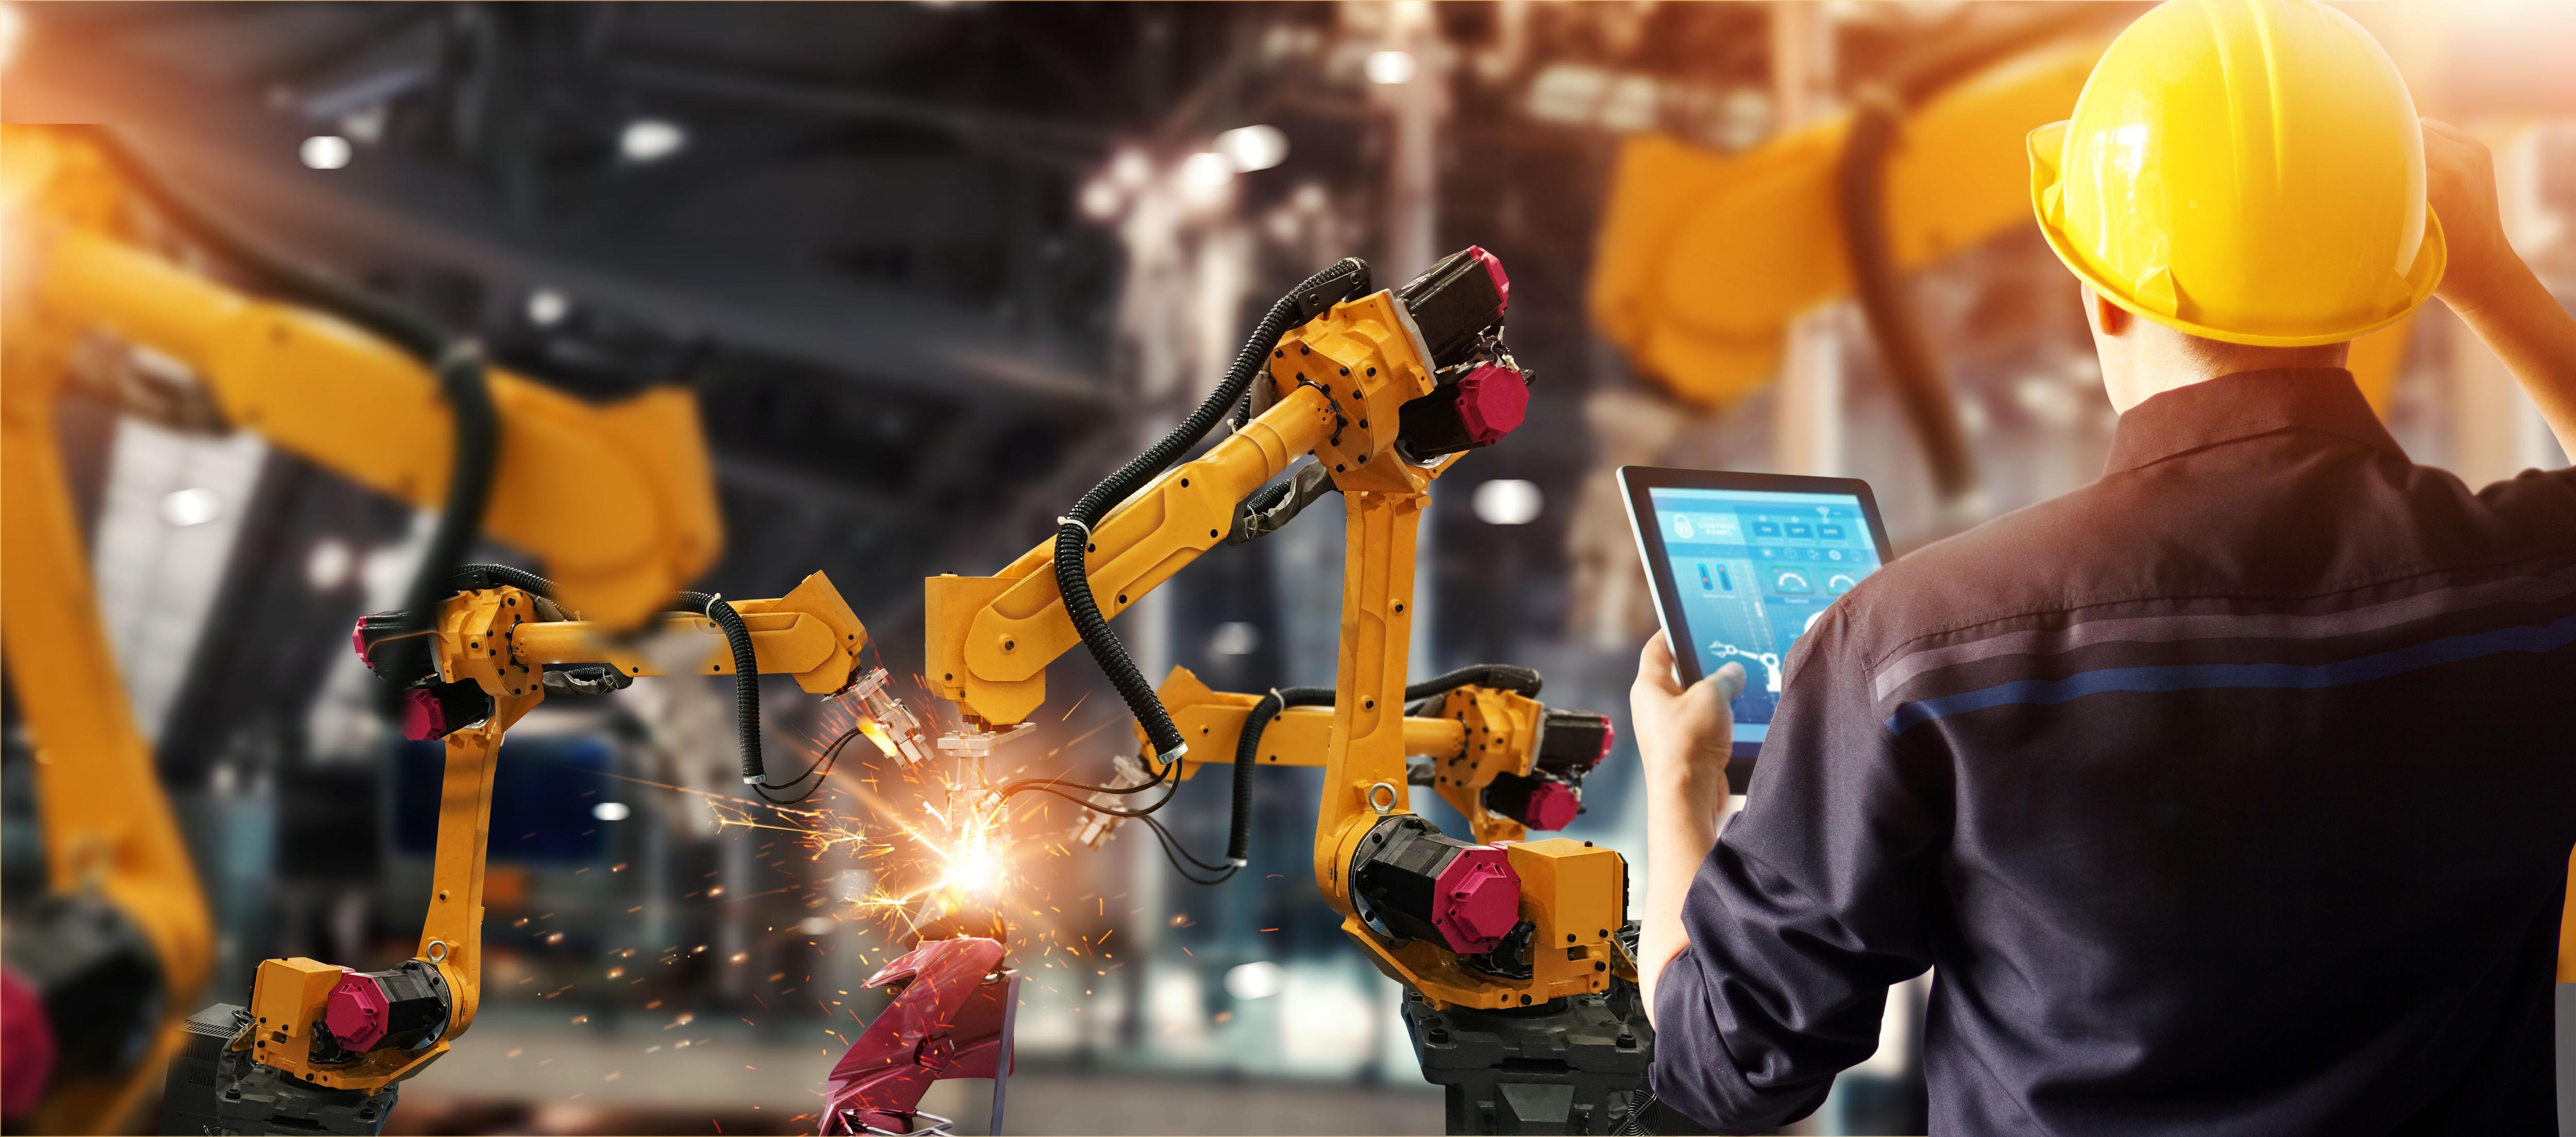 engineer-check-control-welding-robotics-automatic-arms-machine.jpg